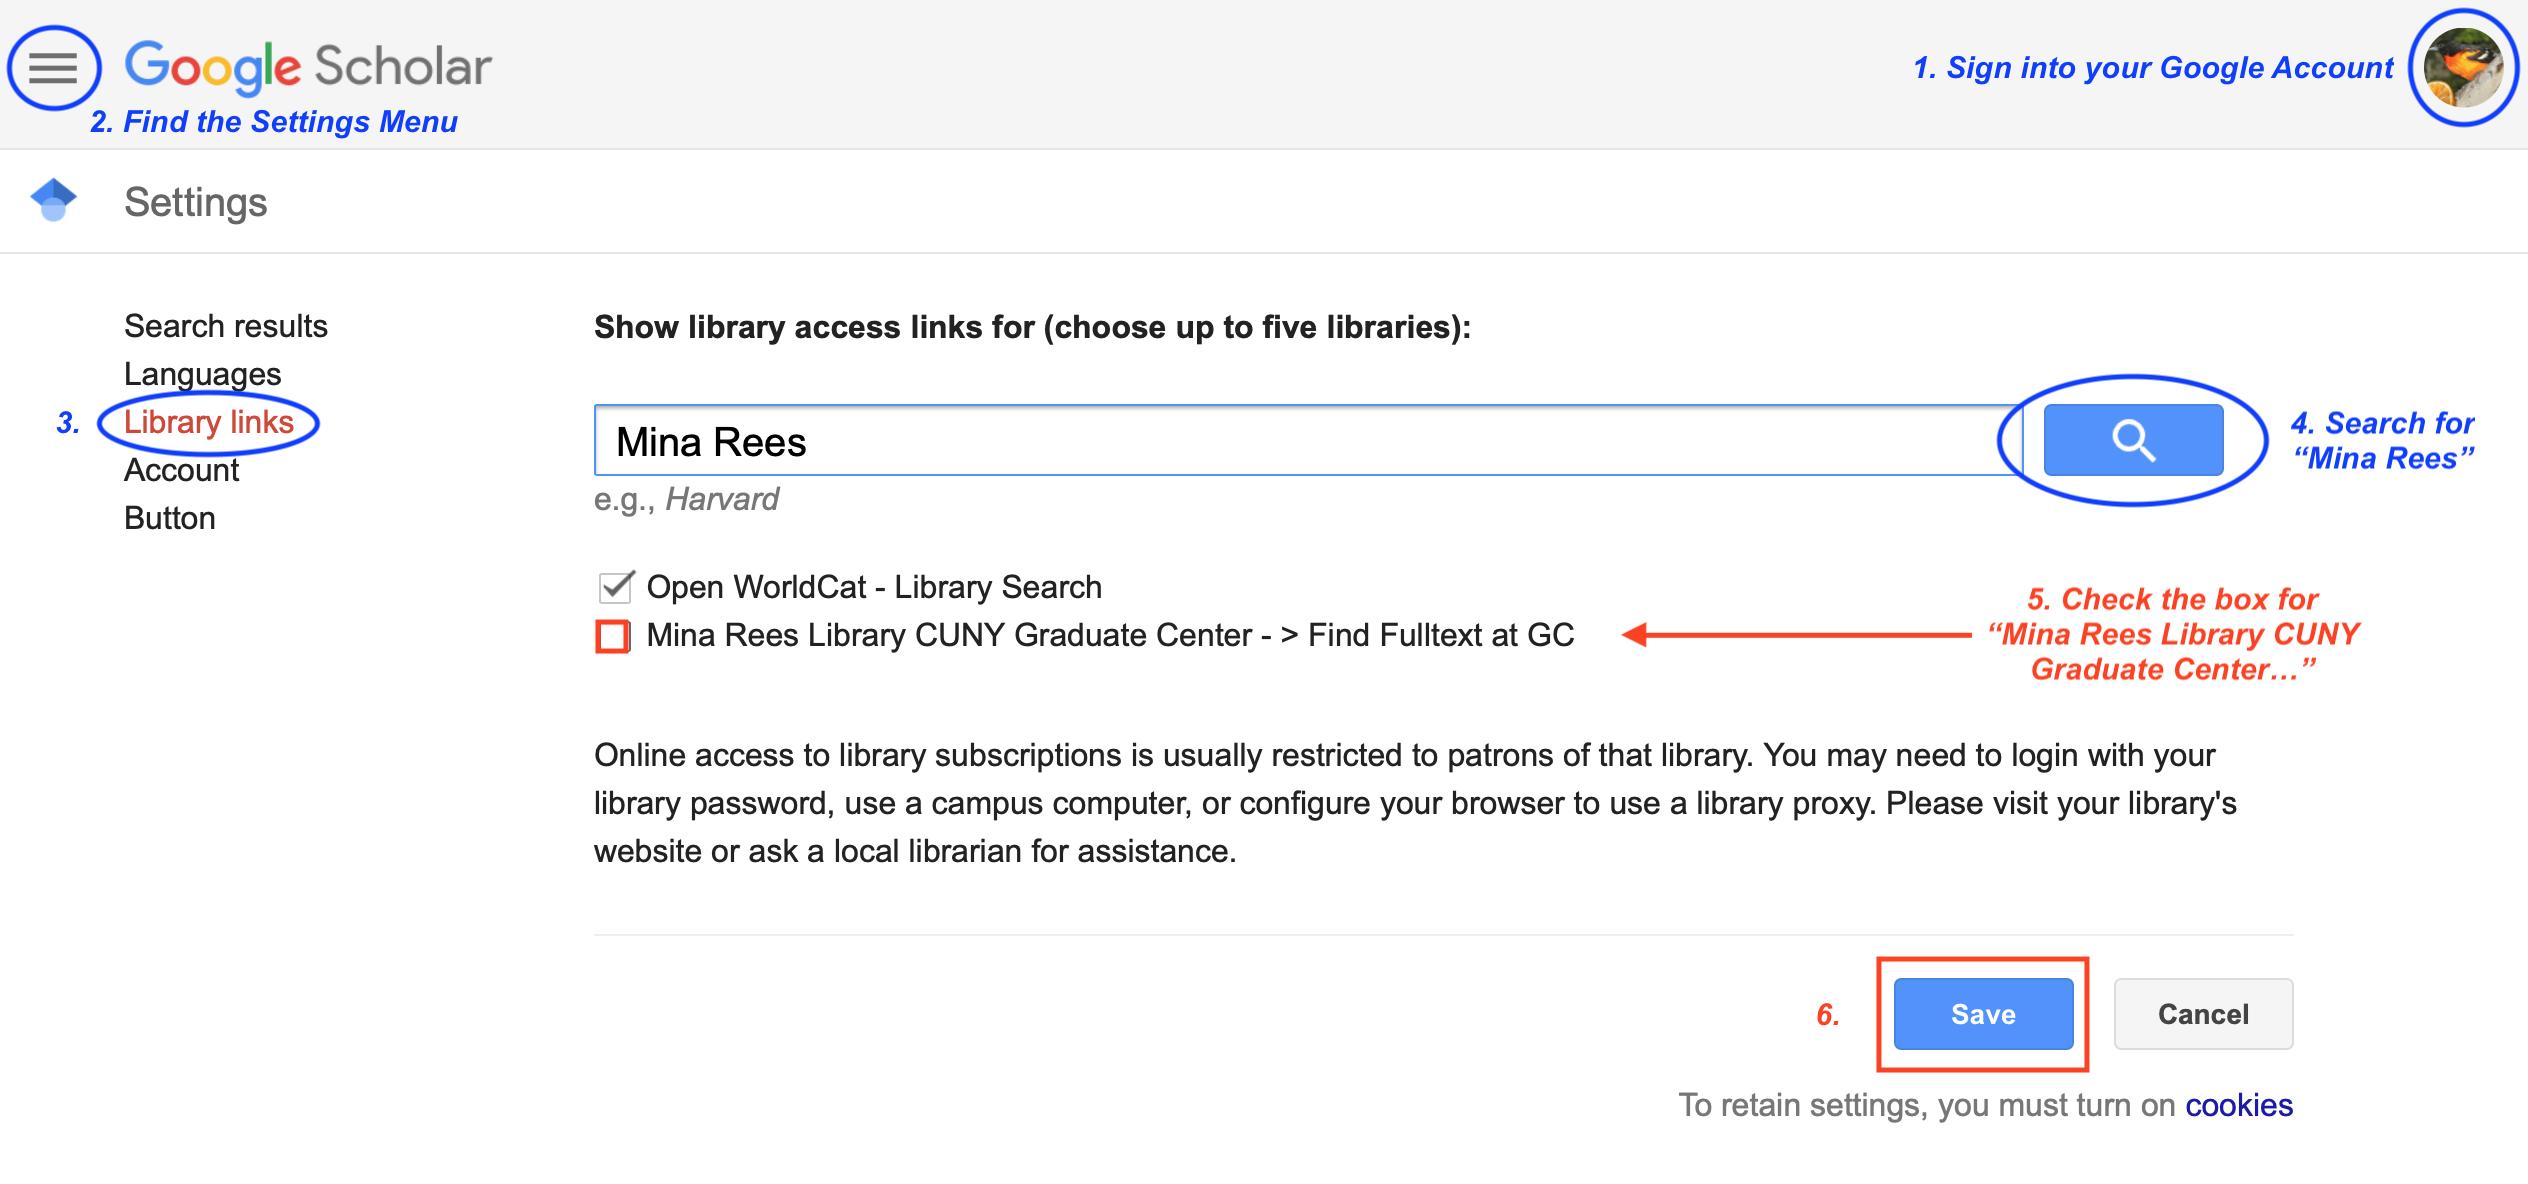 Google Scholar customization